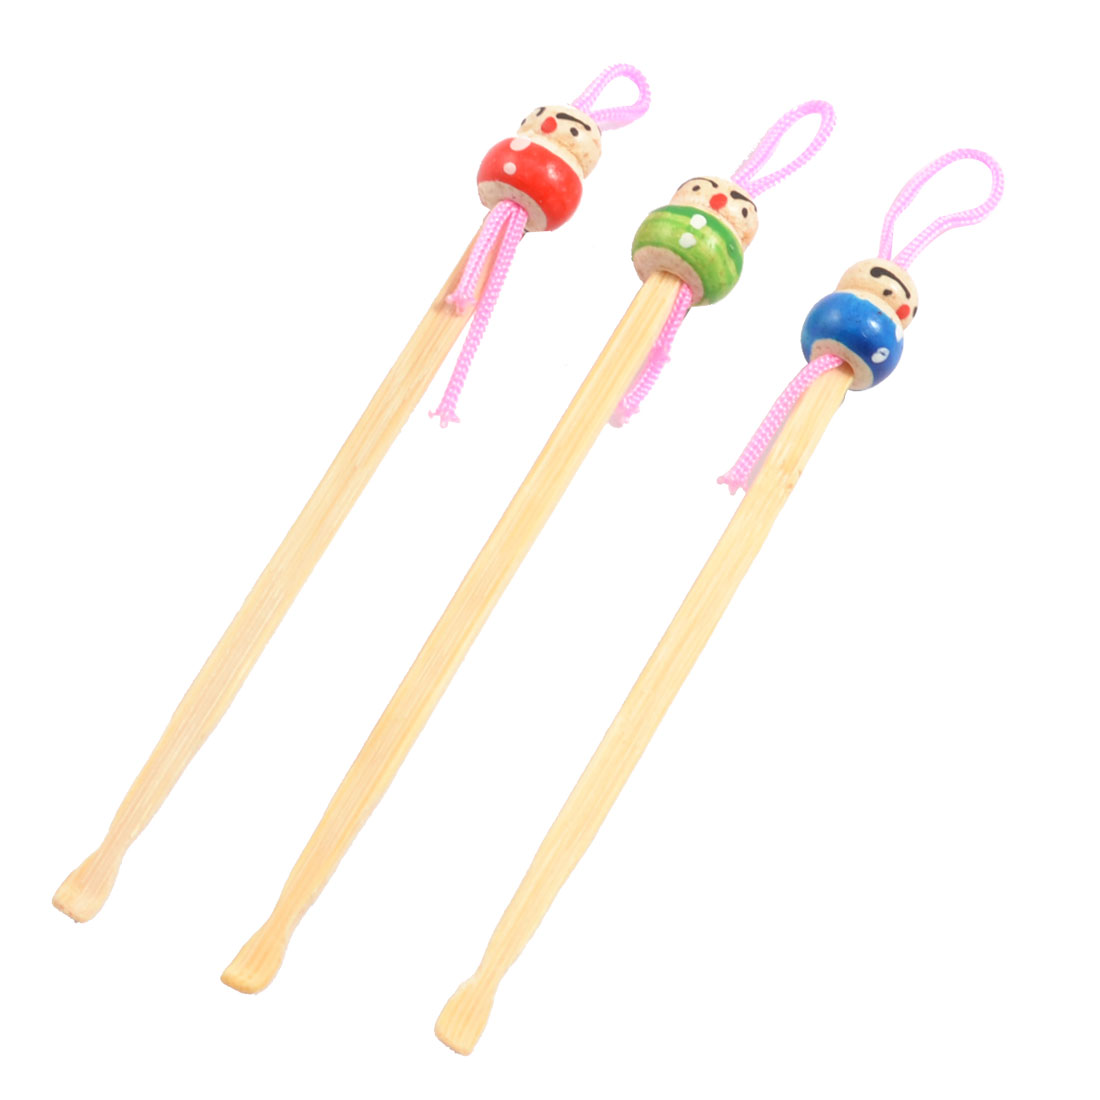 Bamboo Ear Pick Spoon Curette Ear Wax Remover Cartoon Doll Decor 3 Pcs